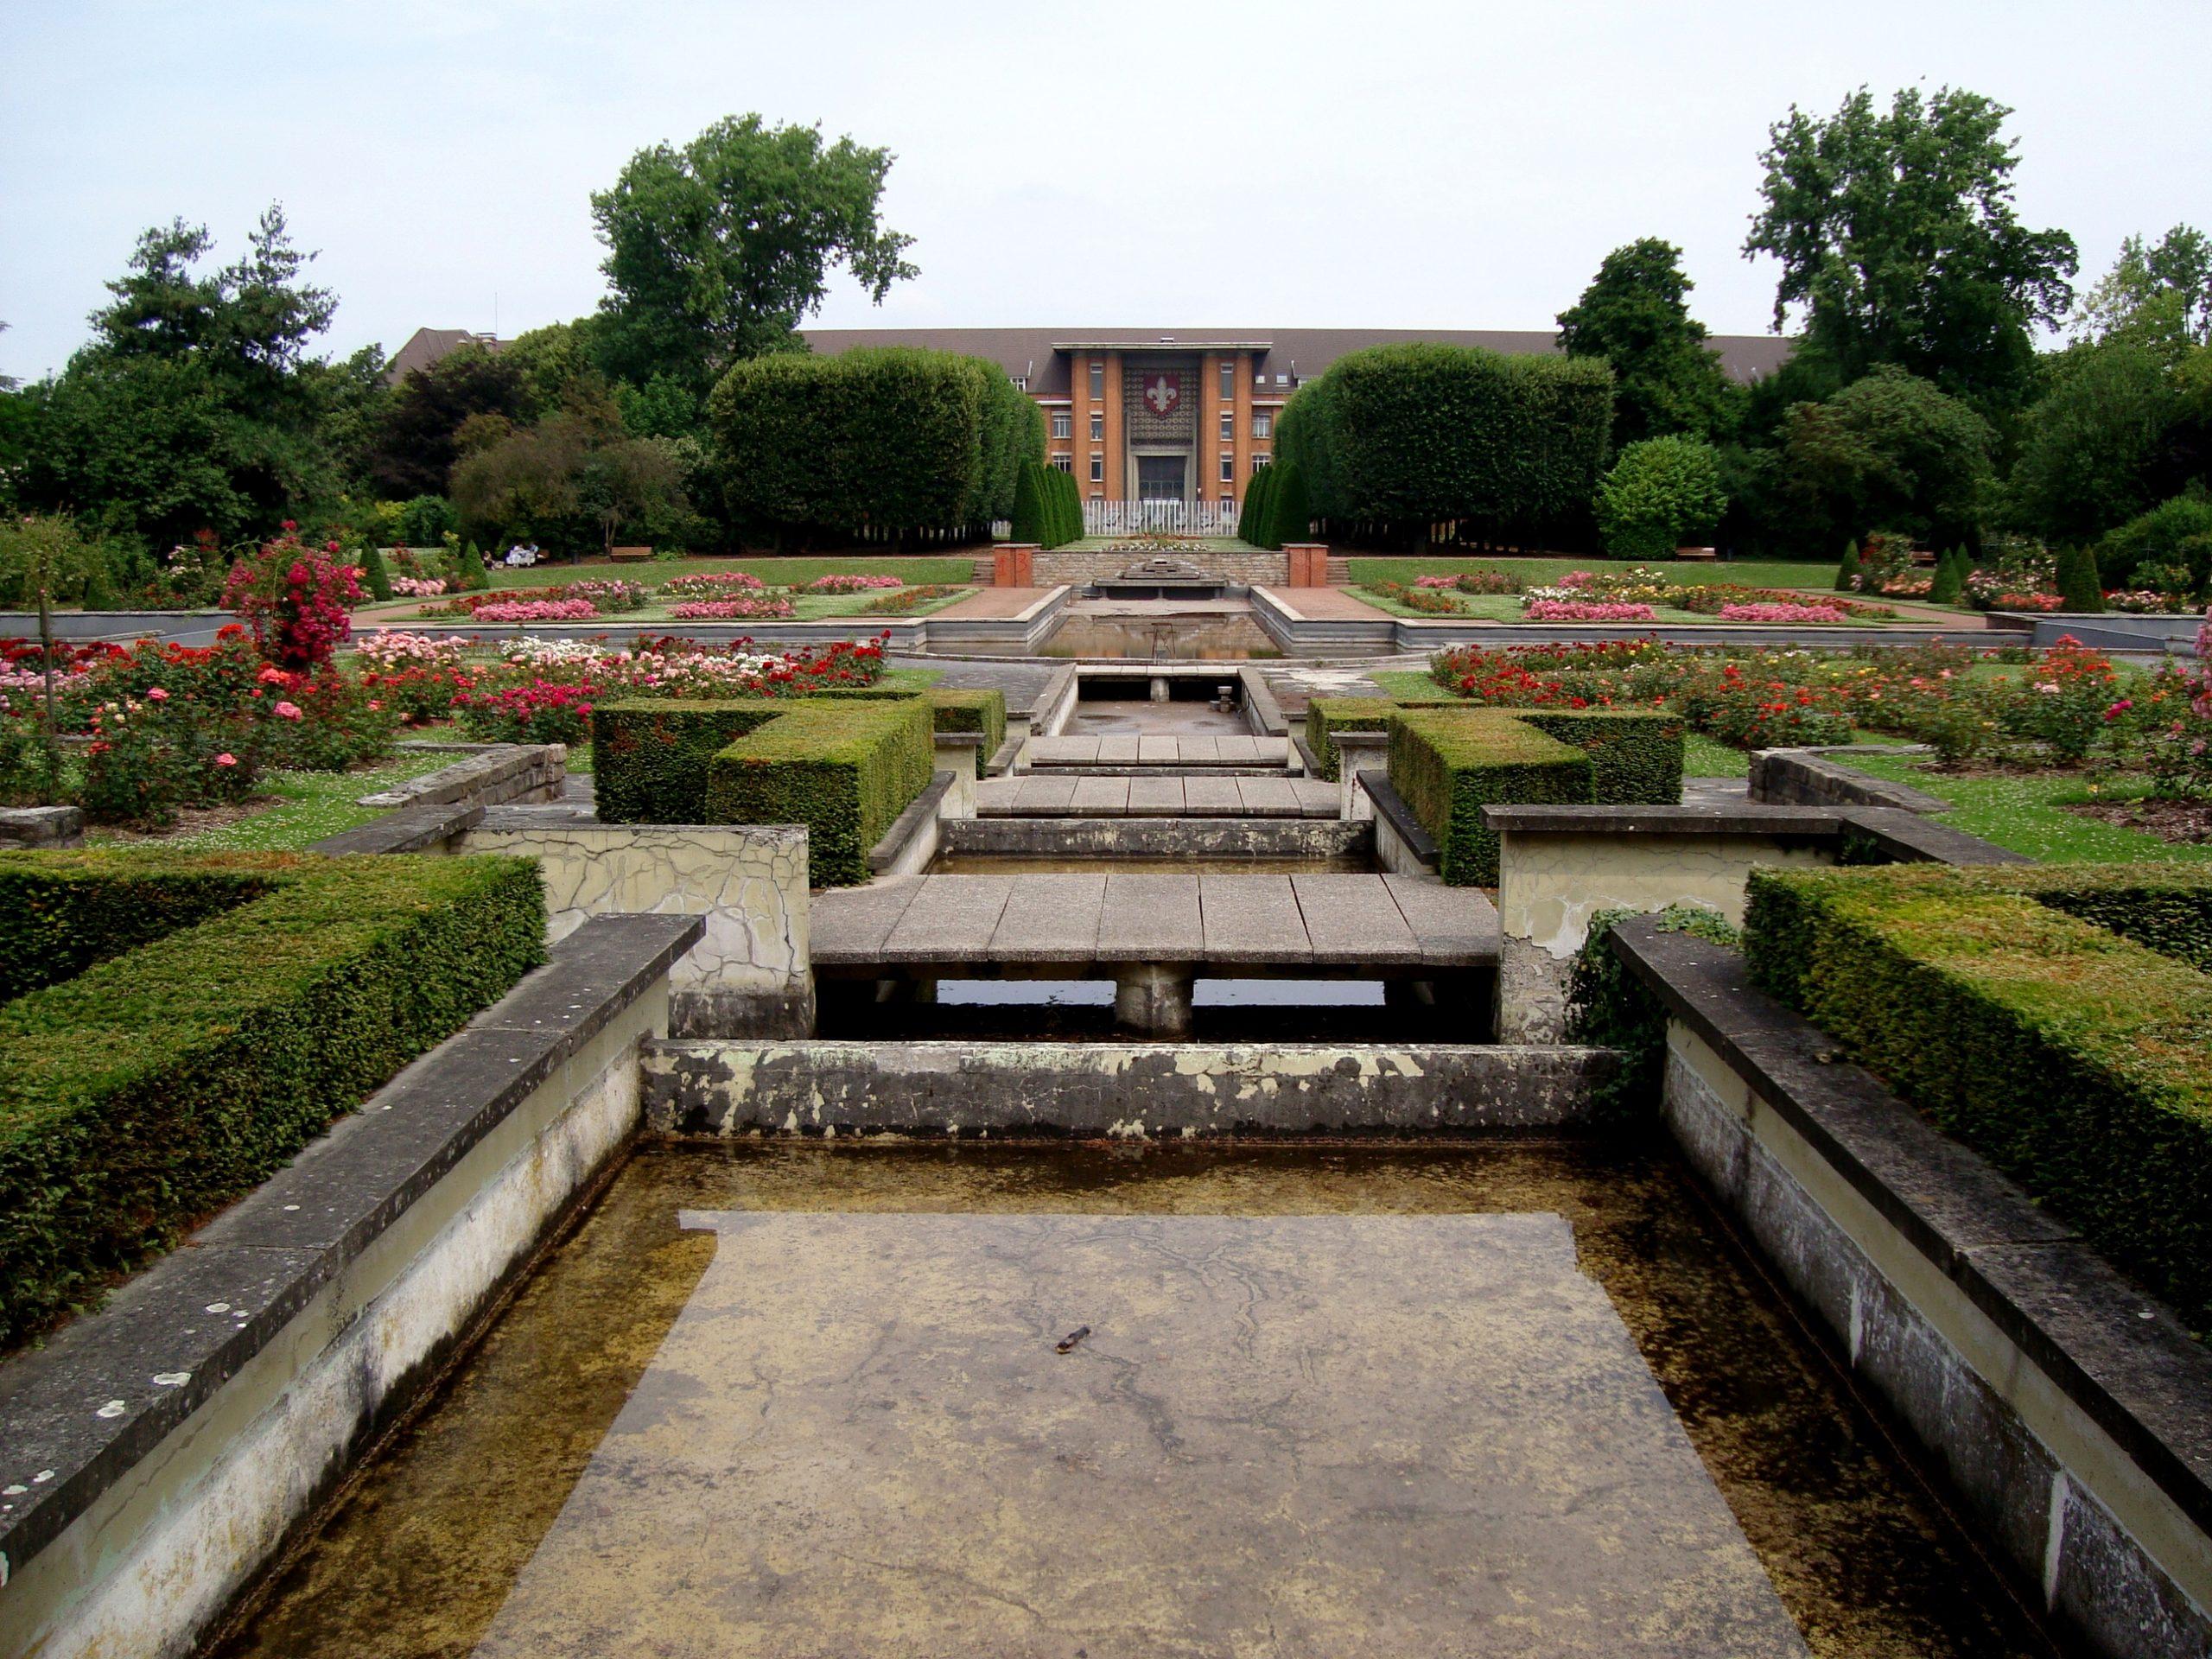 File:lille Jardin Plantes Bassin.jpg - Wikimedia Commons à Plante Bassin De Jardin